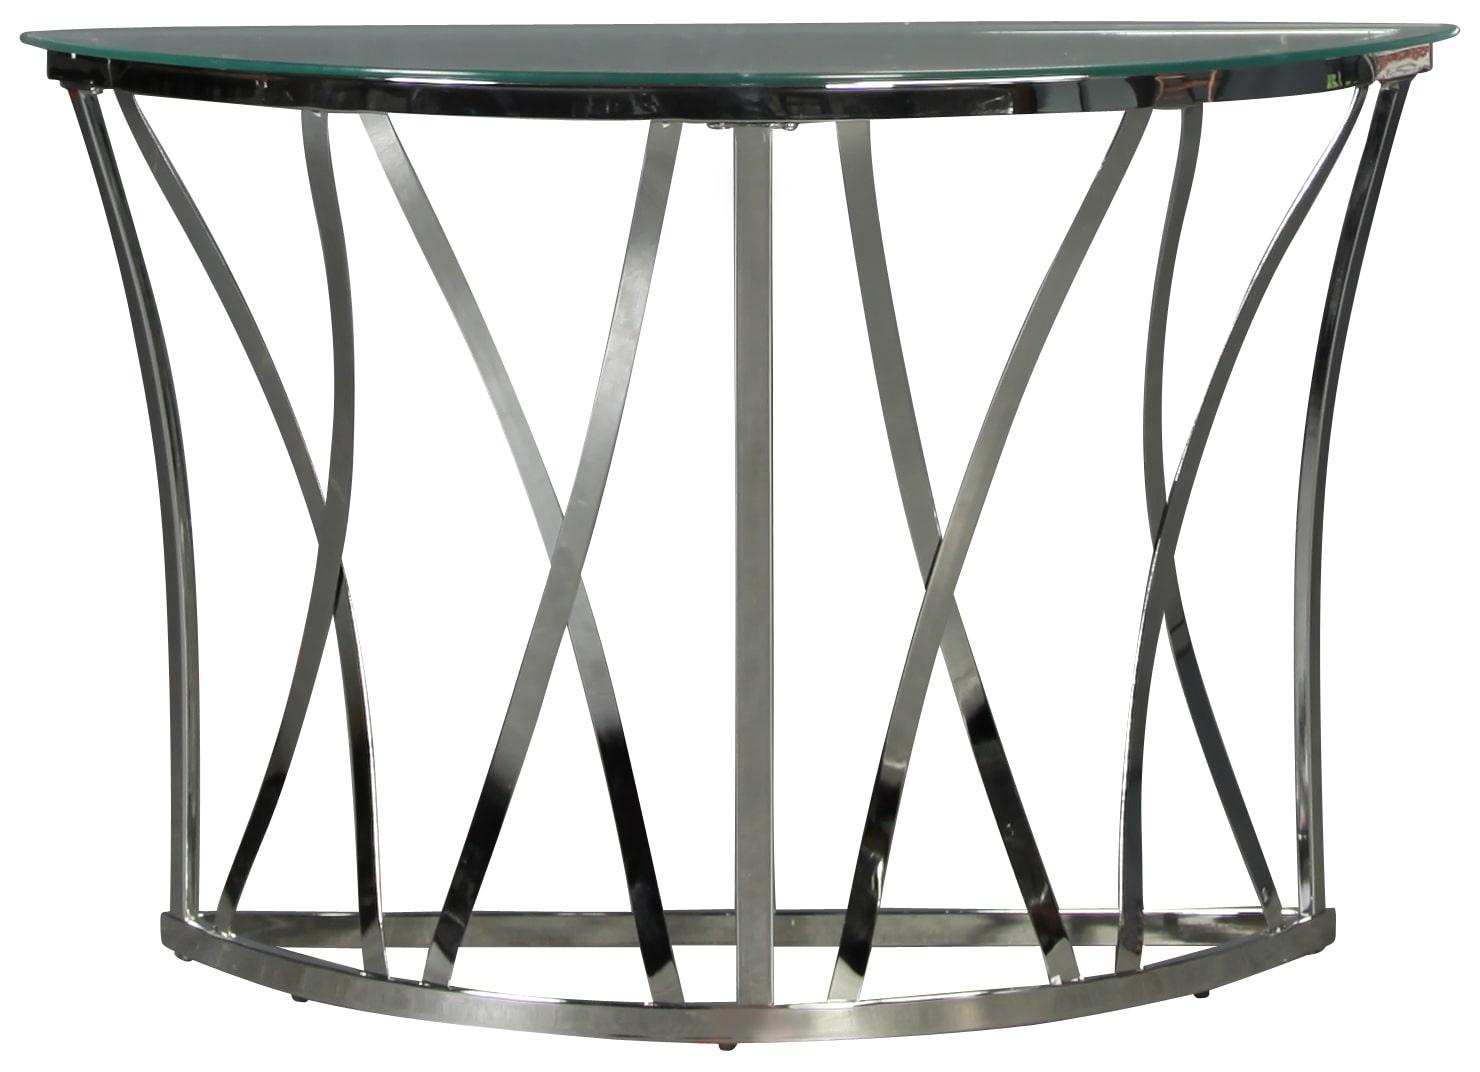 iggy sofa table - White Sofa Table